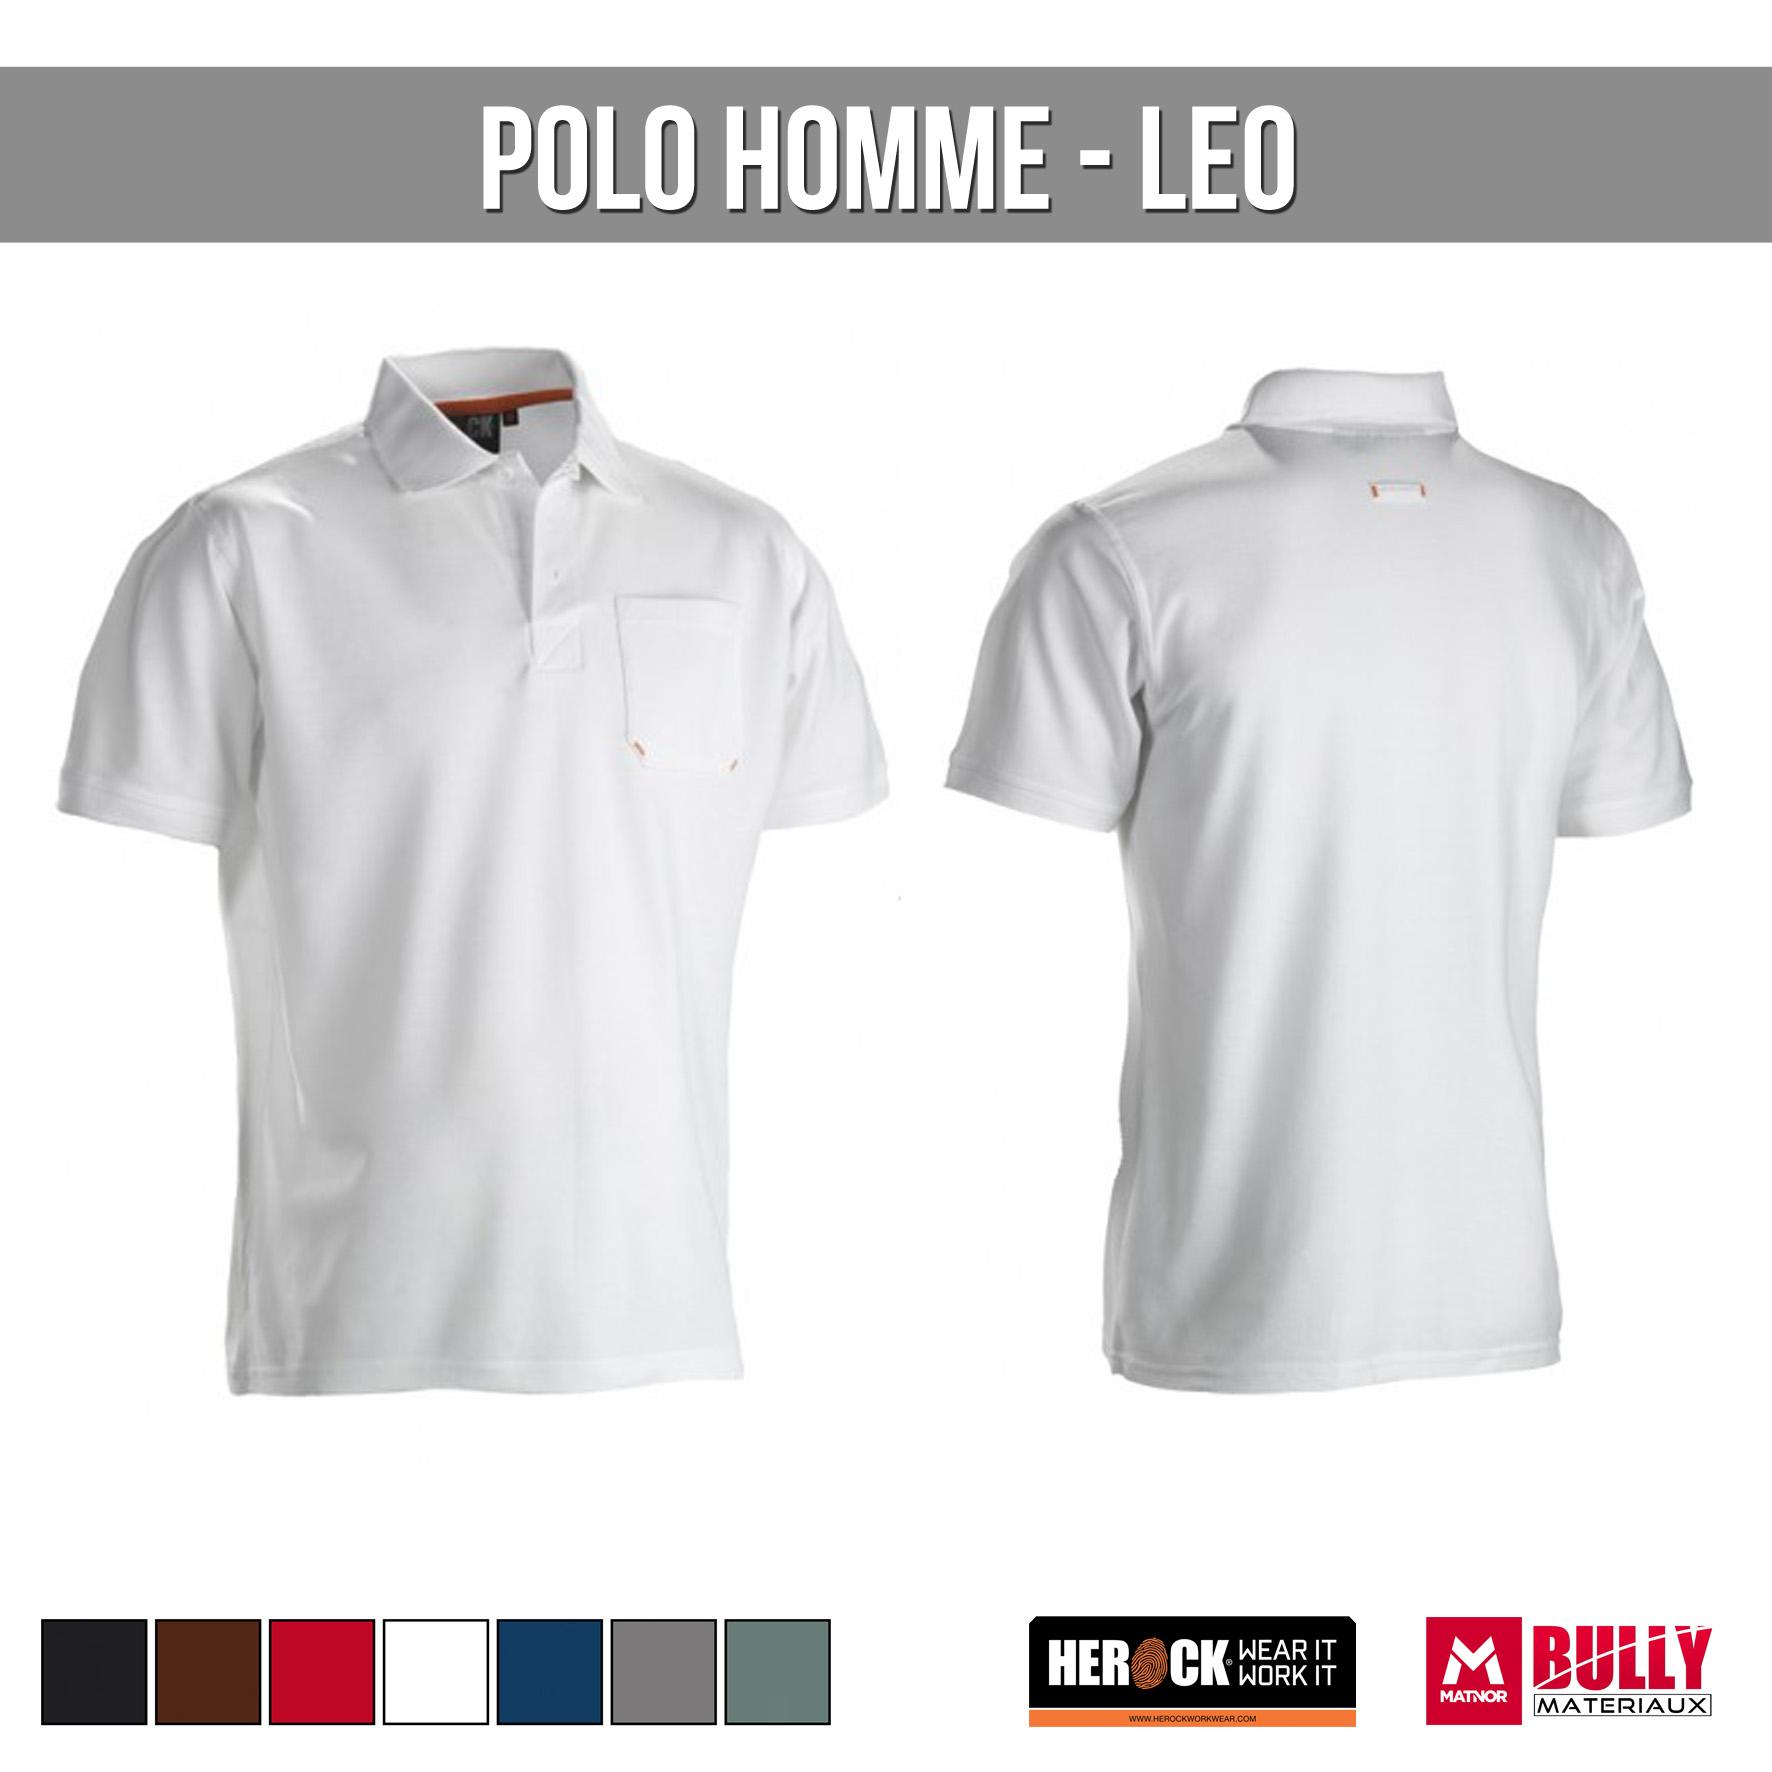 Polo homme leo